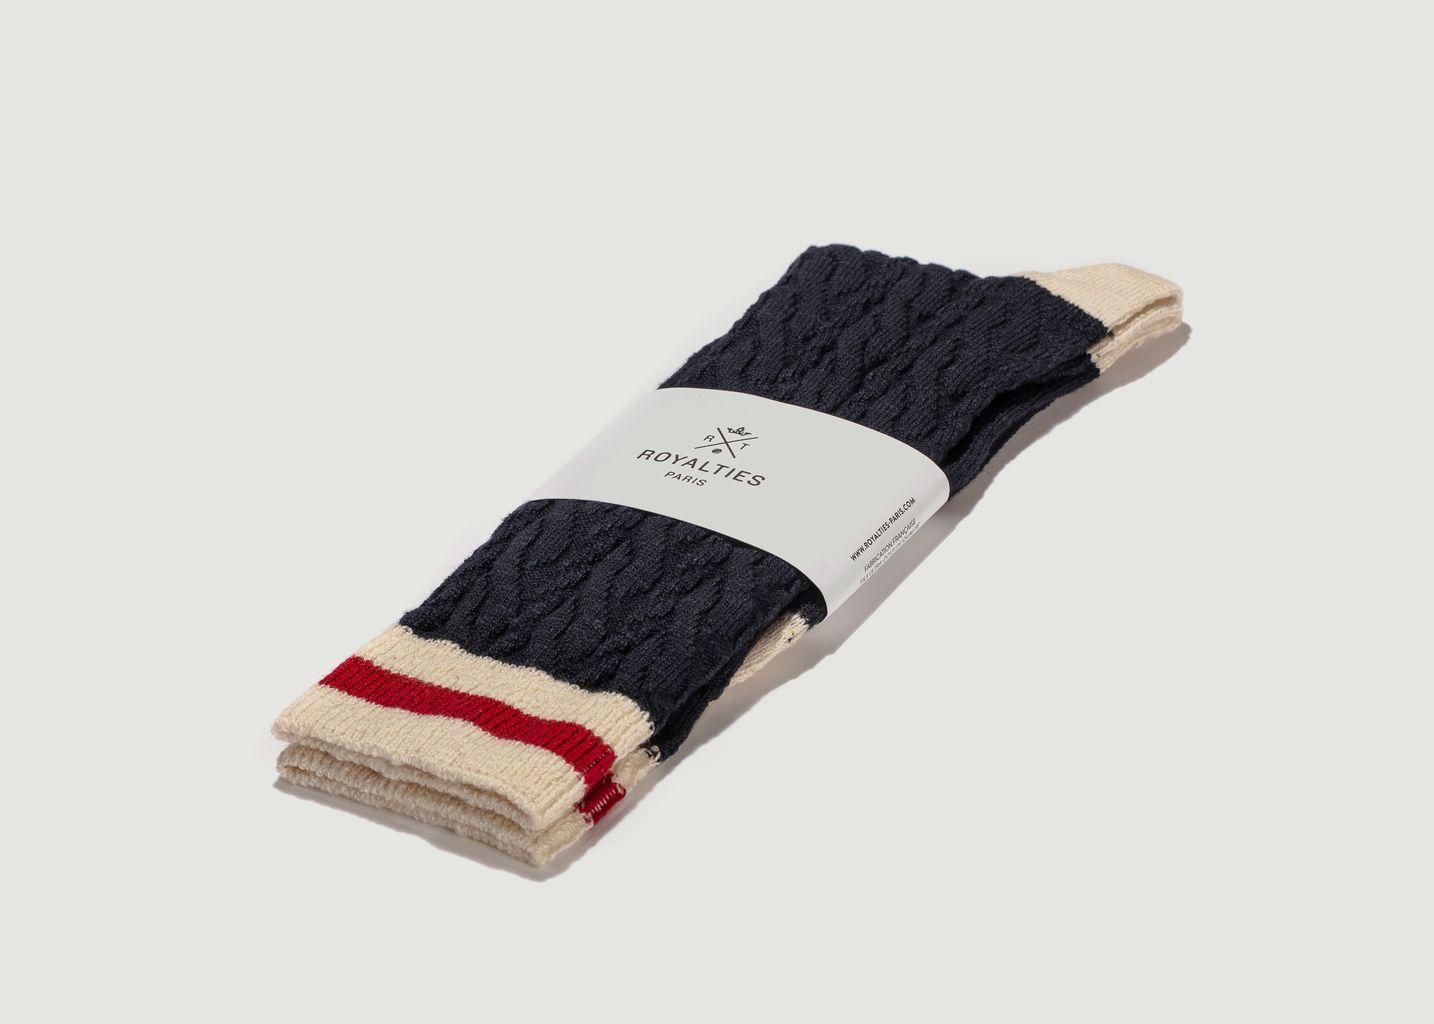 Chaussettes Torsades - Royalties